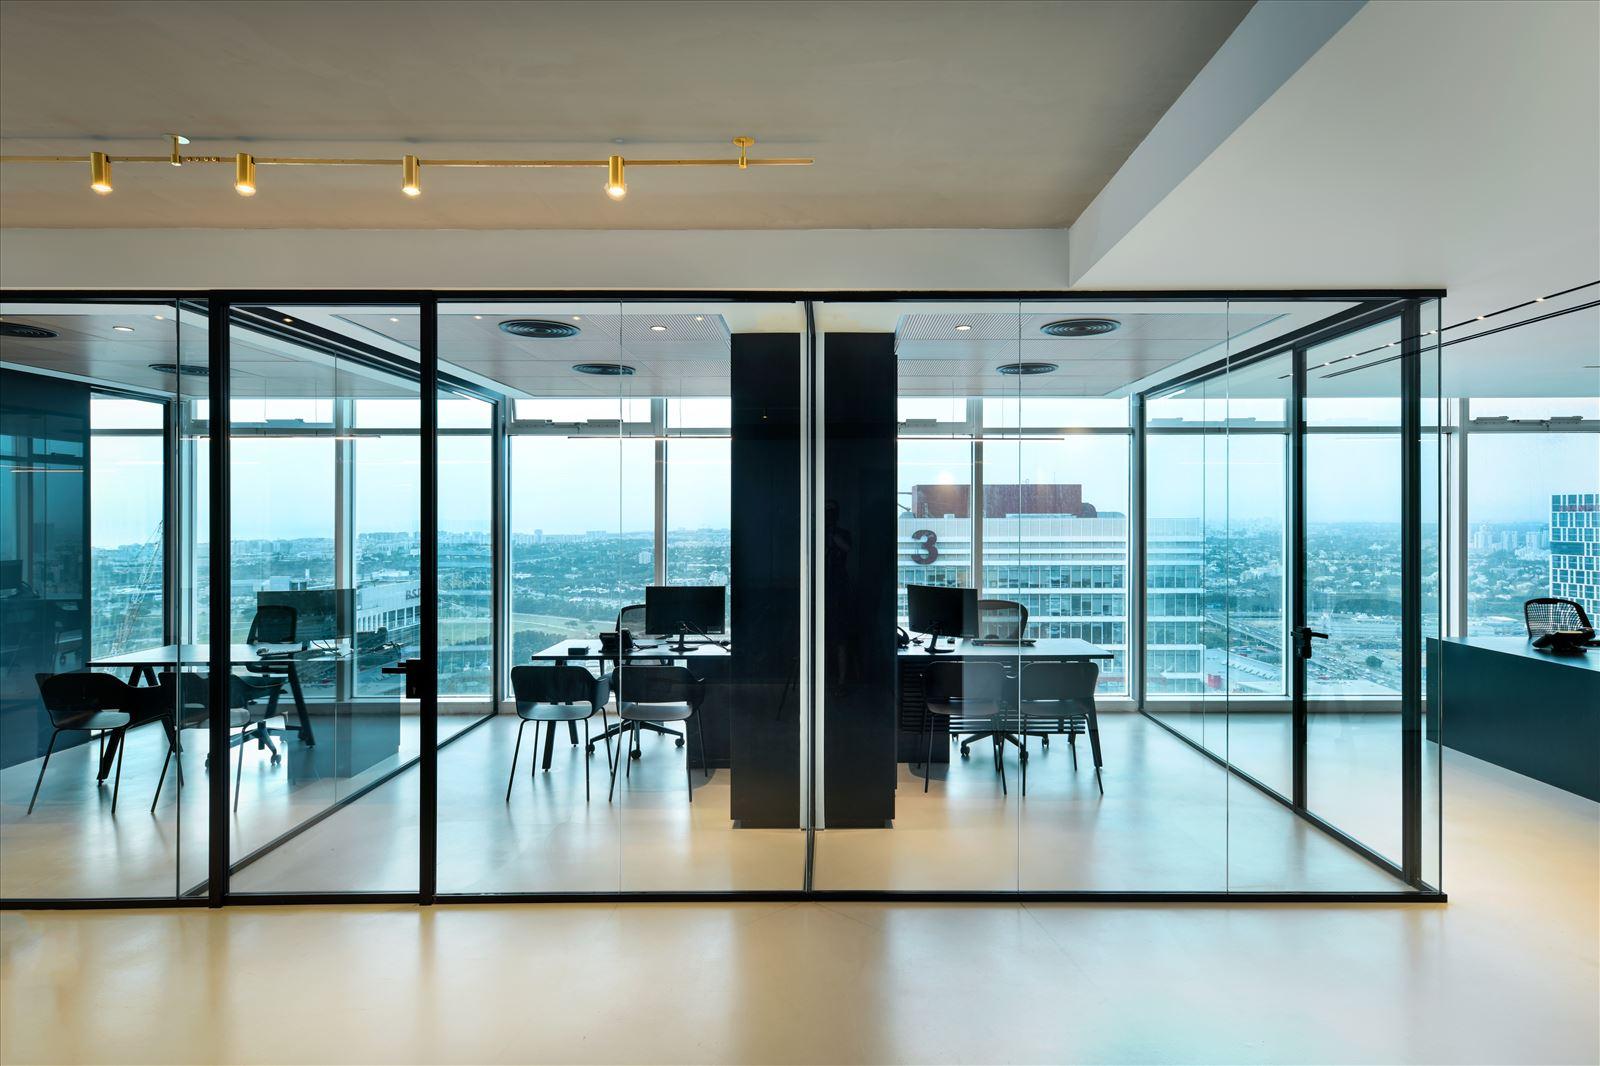 Divident office גוף תאורה המקרין על מסדרון המשרד נעשה על ידי קמחי תאורה